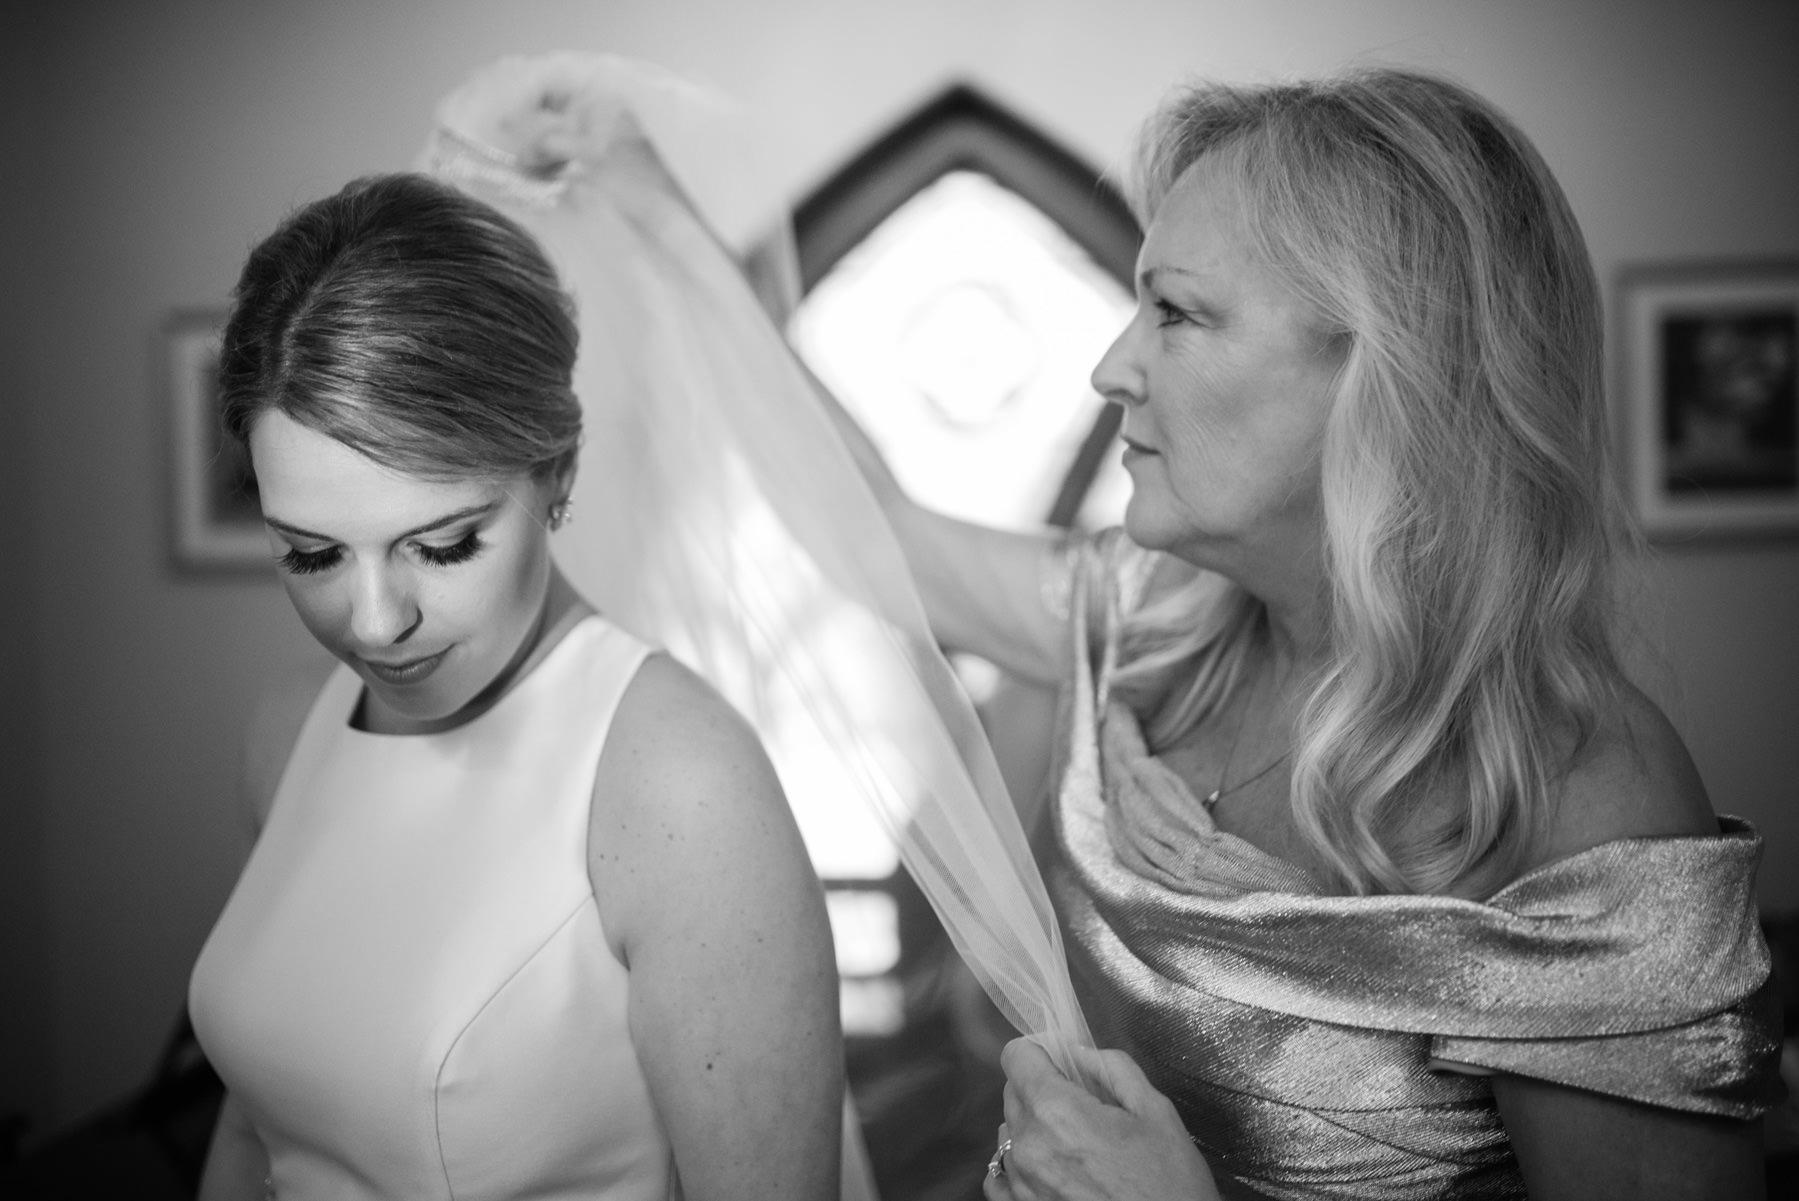 mom puts veil on daughter